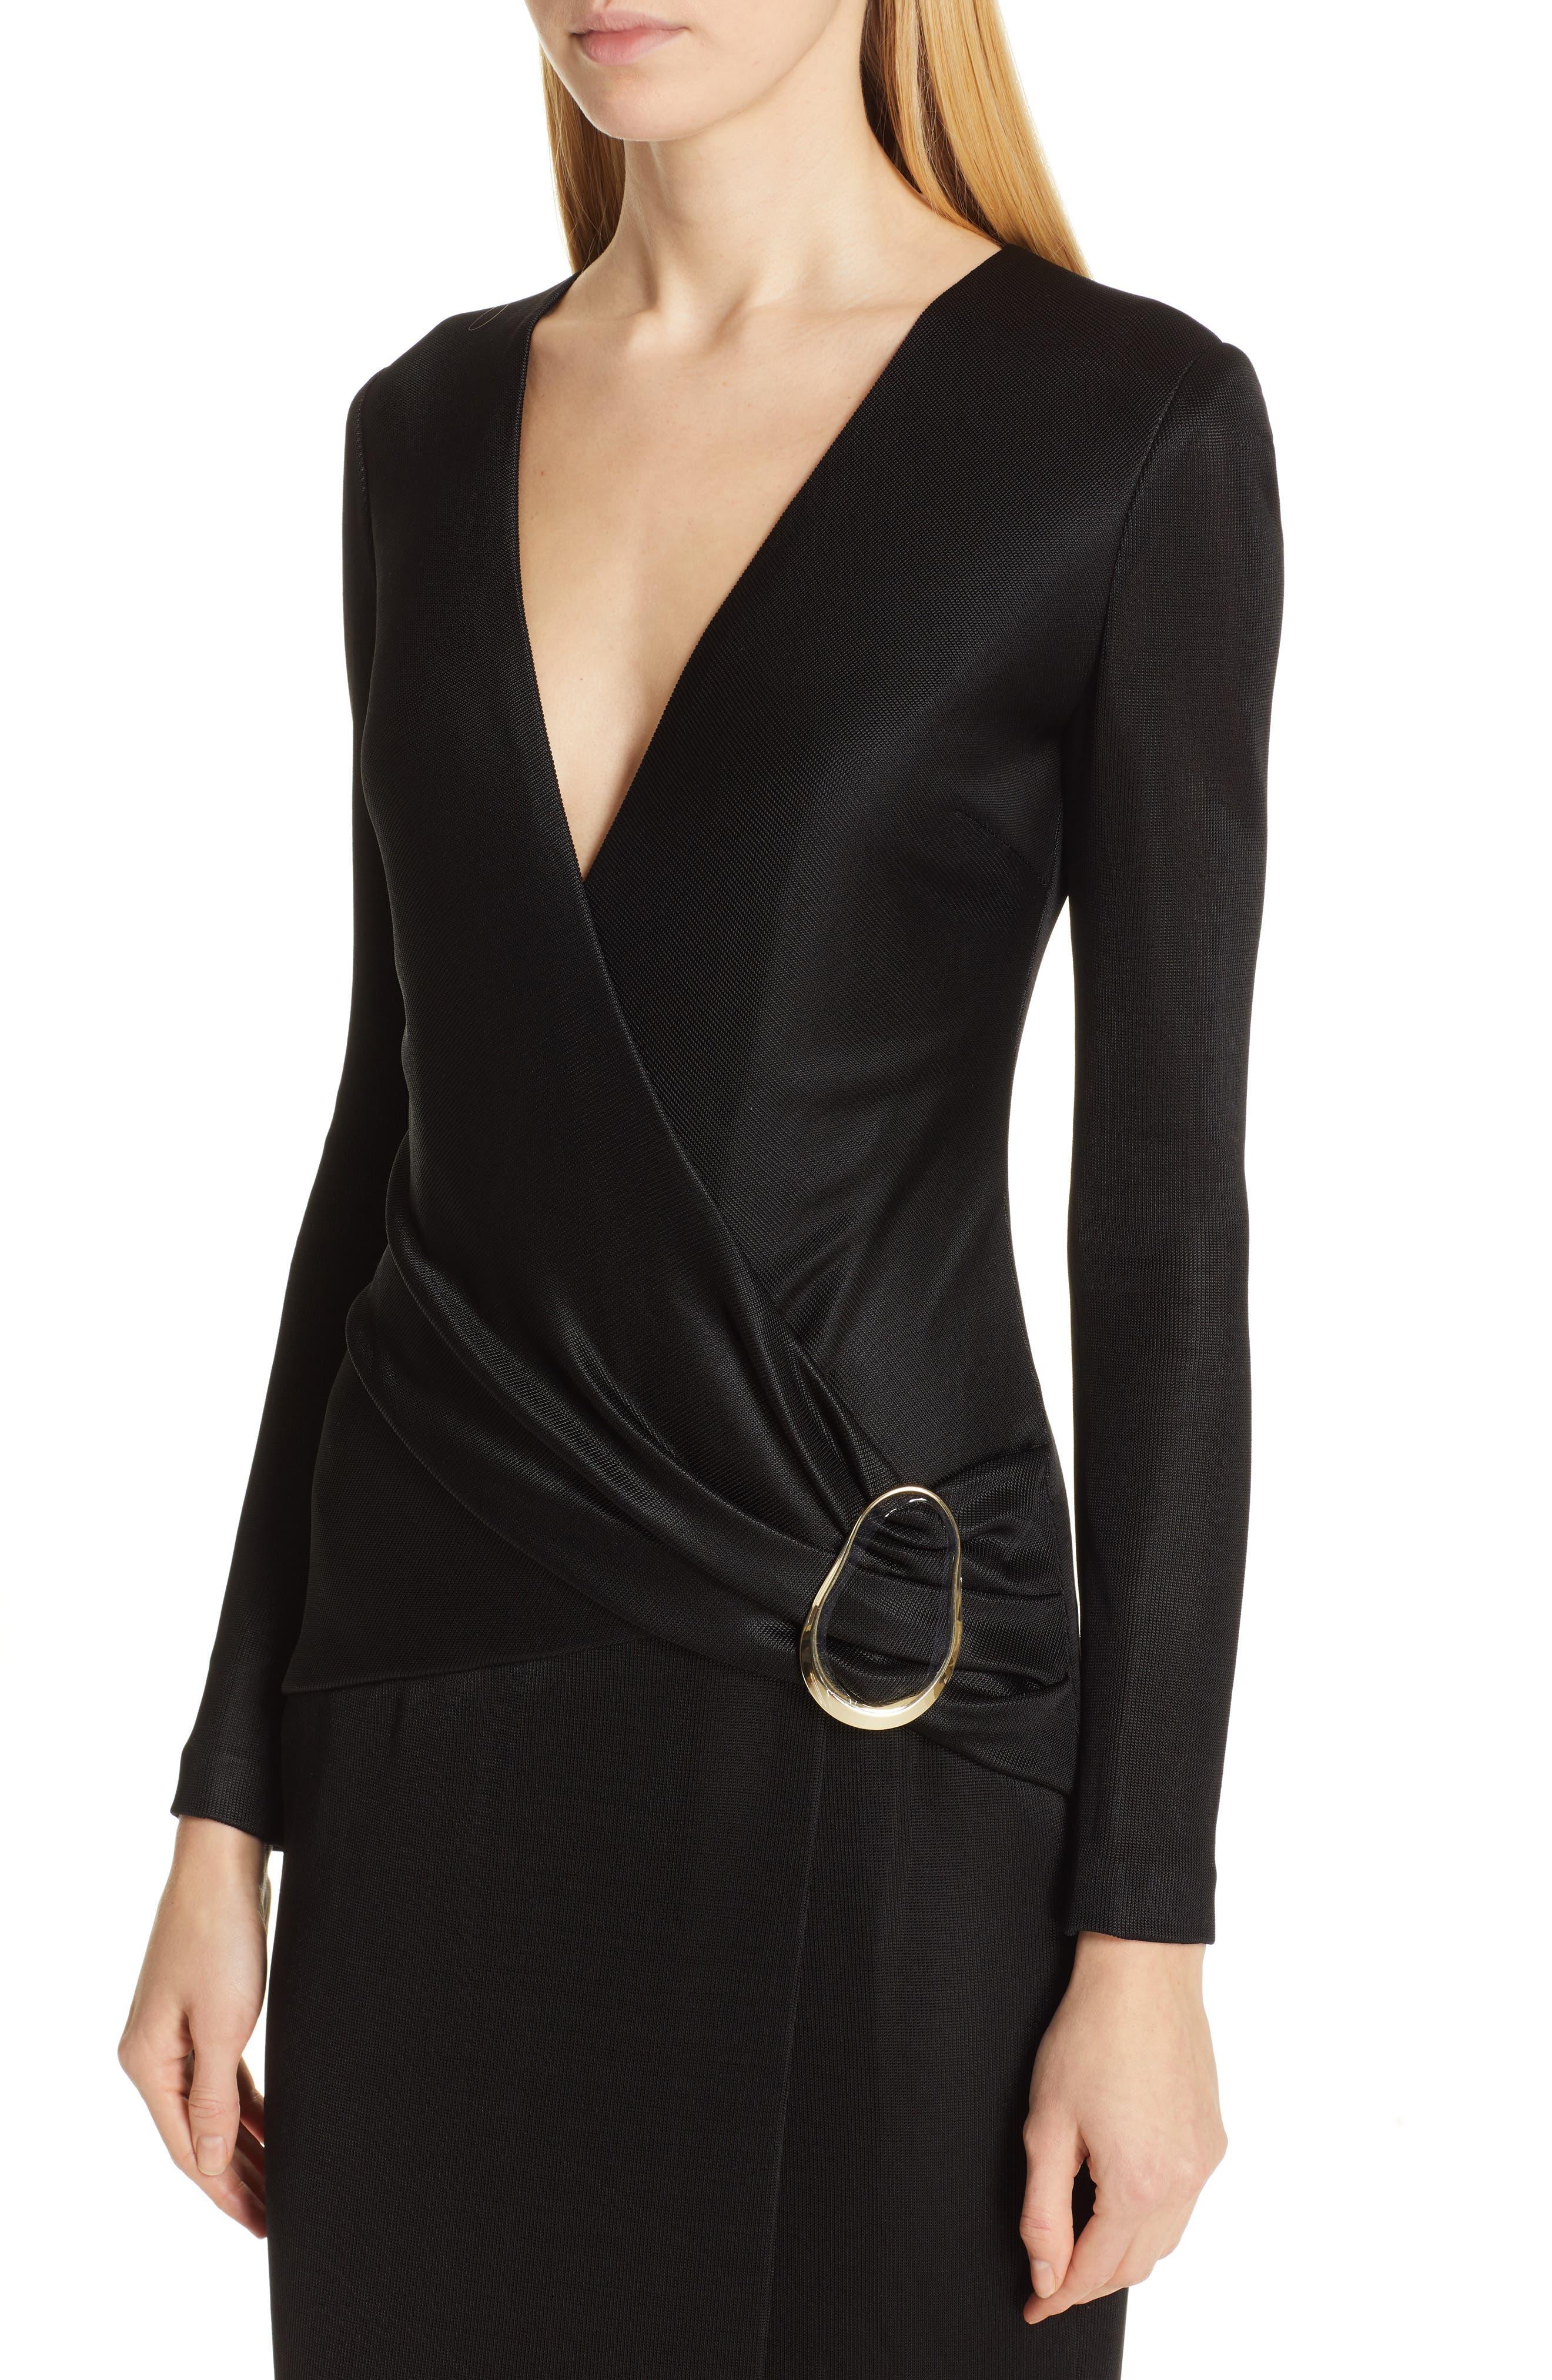 CUSHNIE, Sahara Pencil Dress, Alternate thumbnail 5, color, BLACK